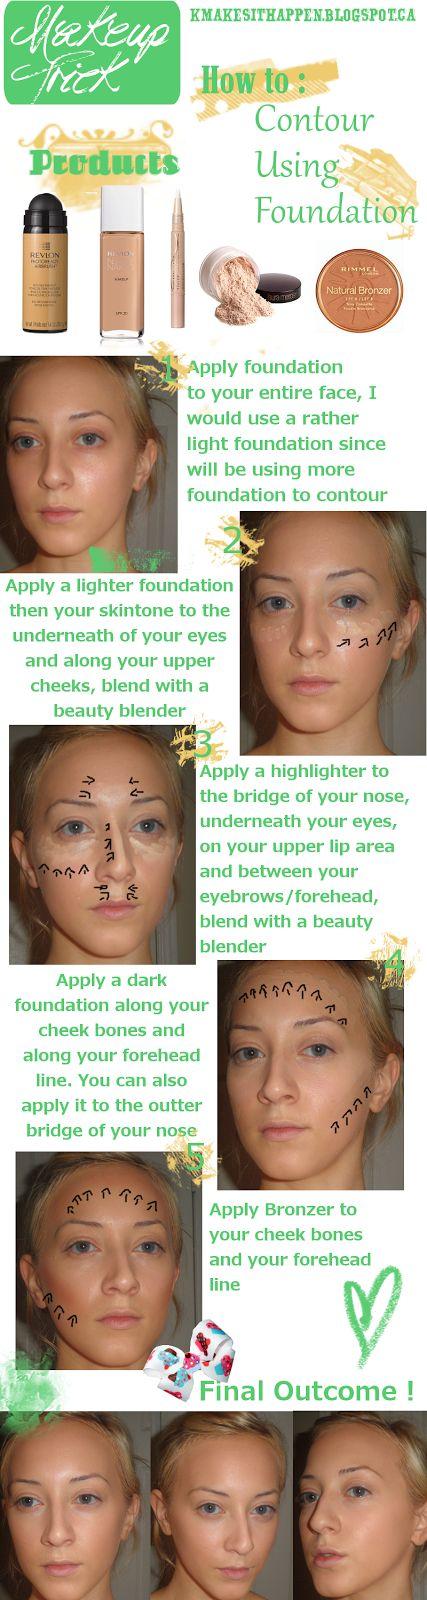 375 best Makeup - Contouring images on Pinterest